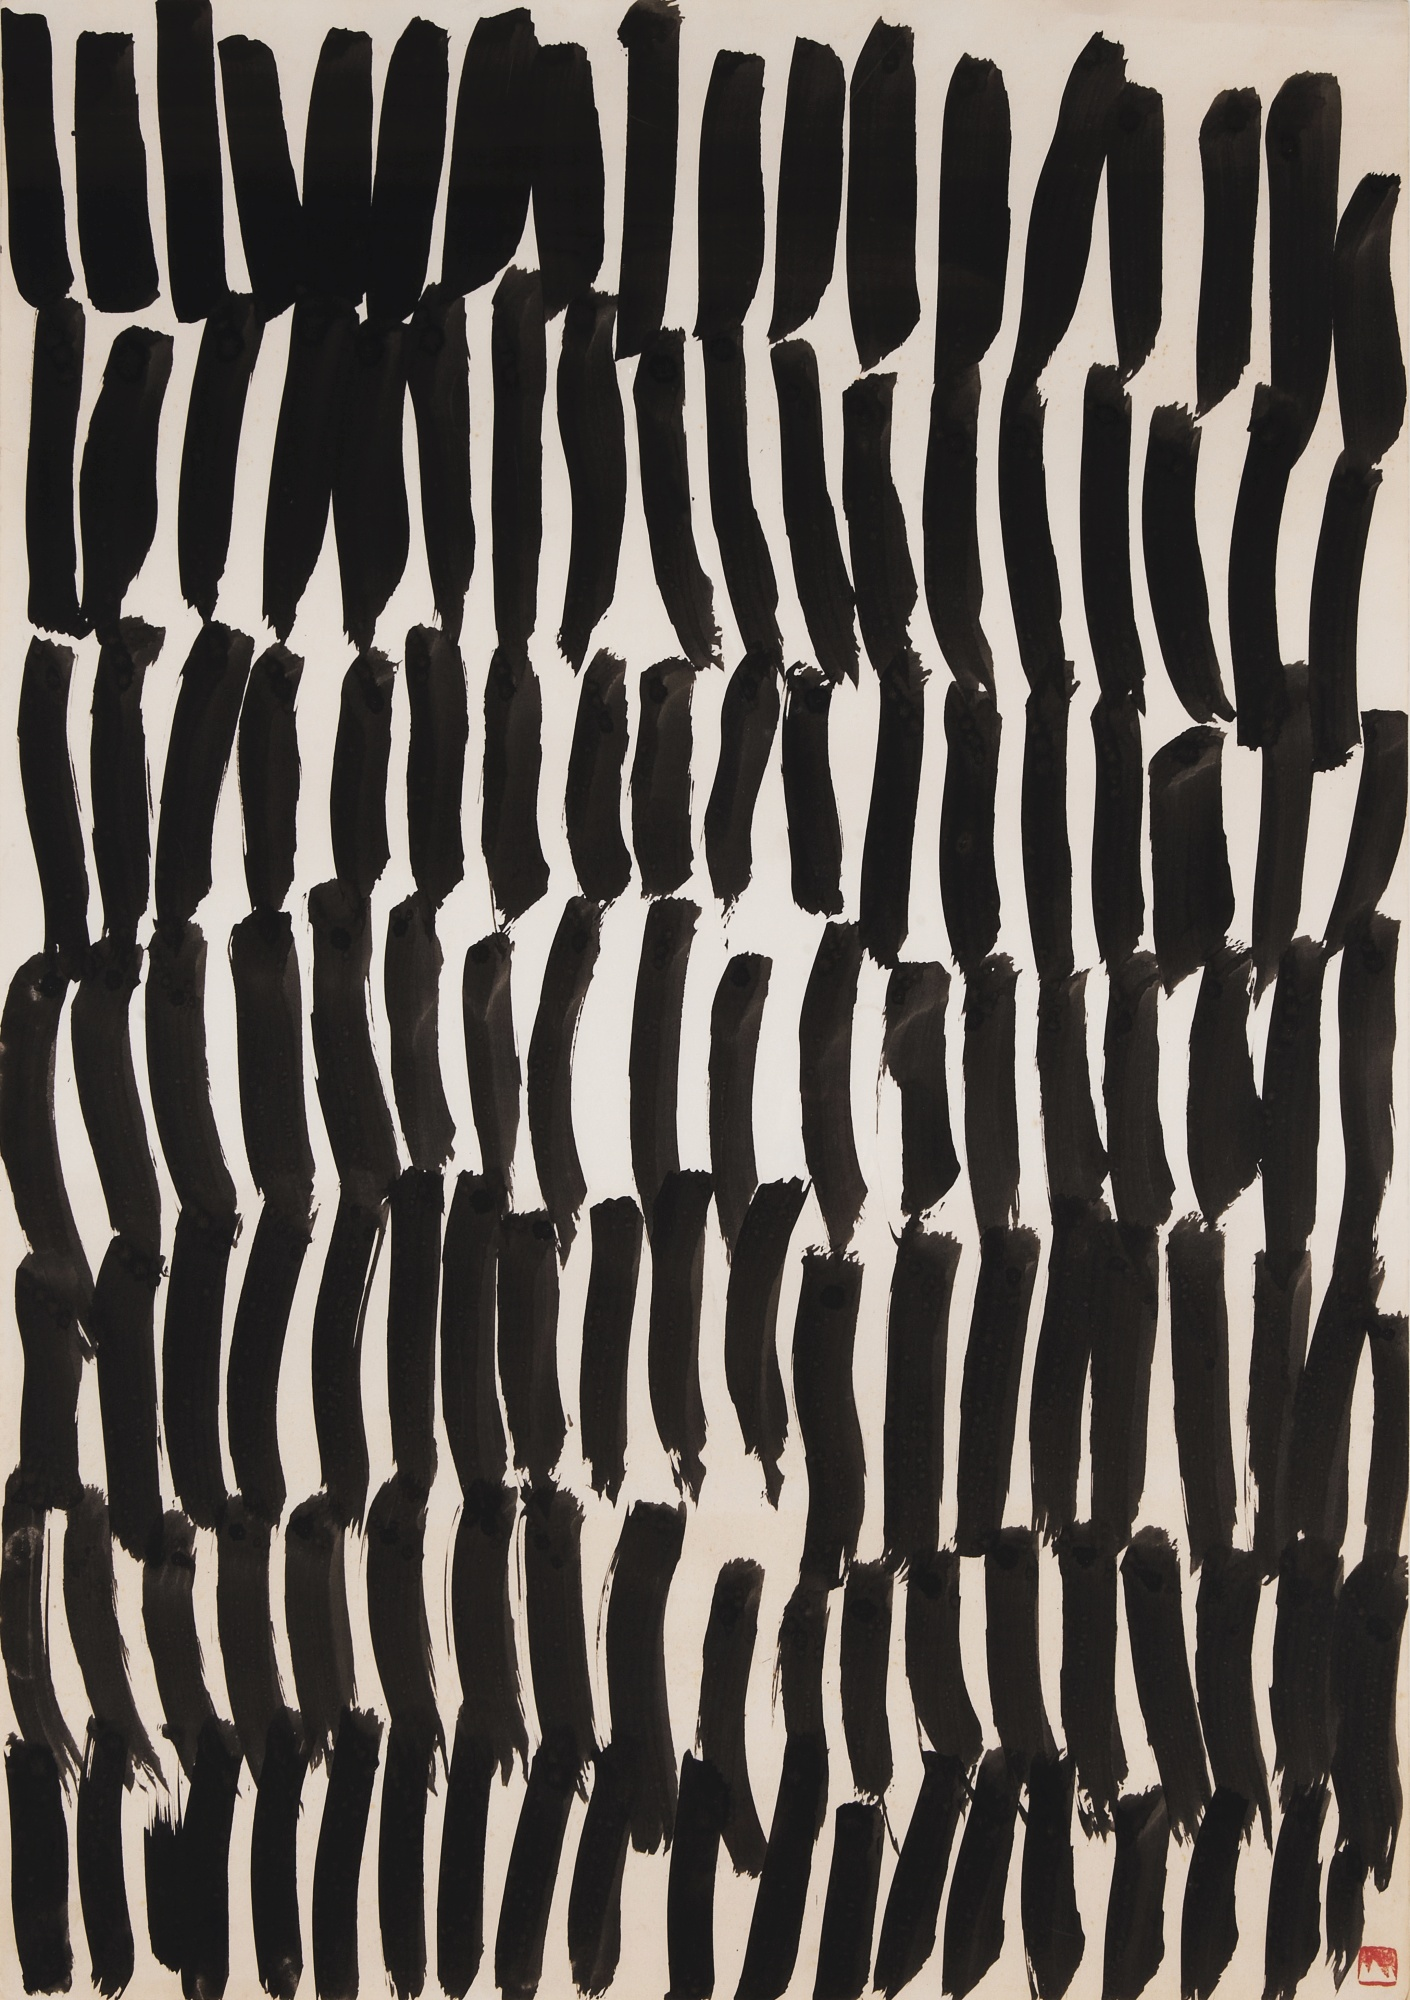 Takeo Yamaguchi-Work-1960